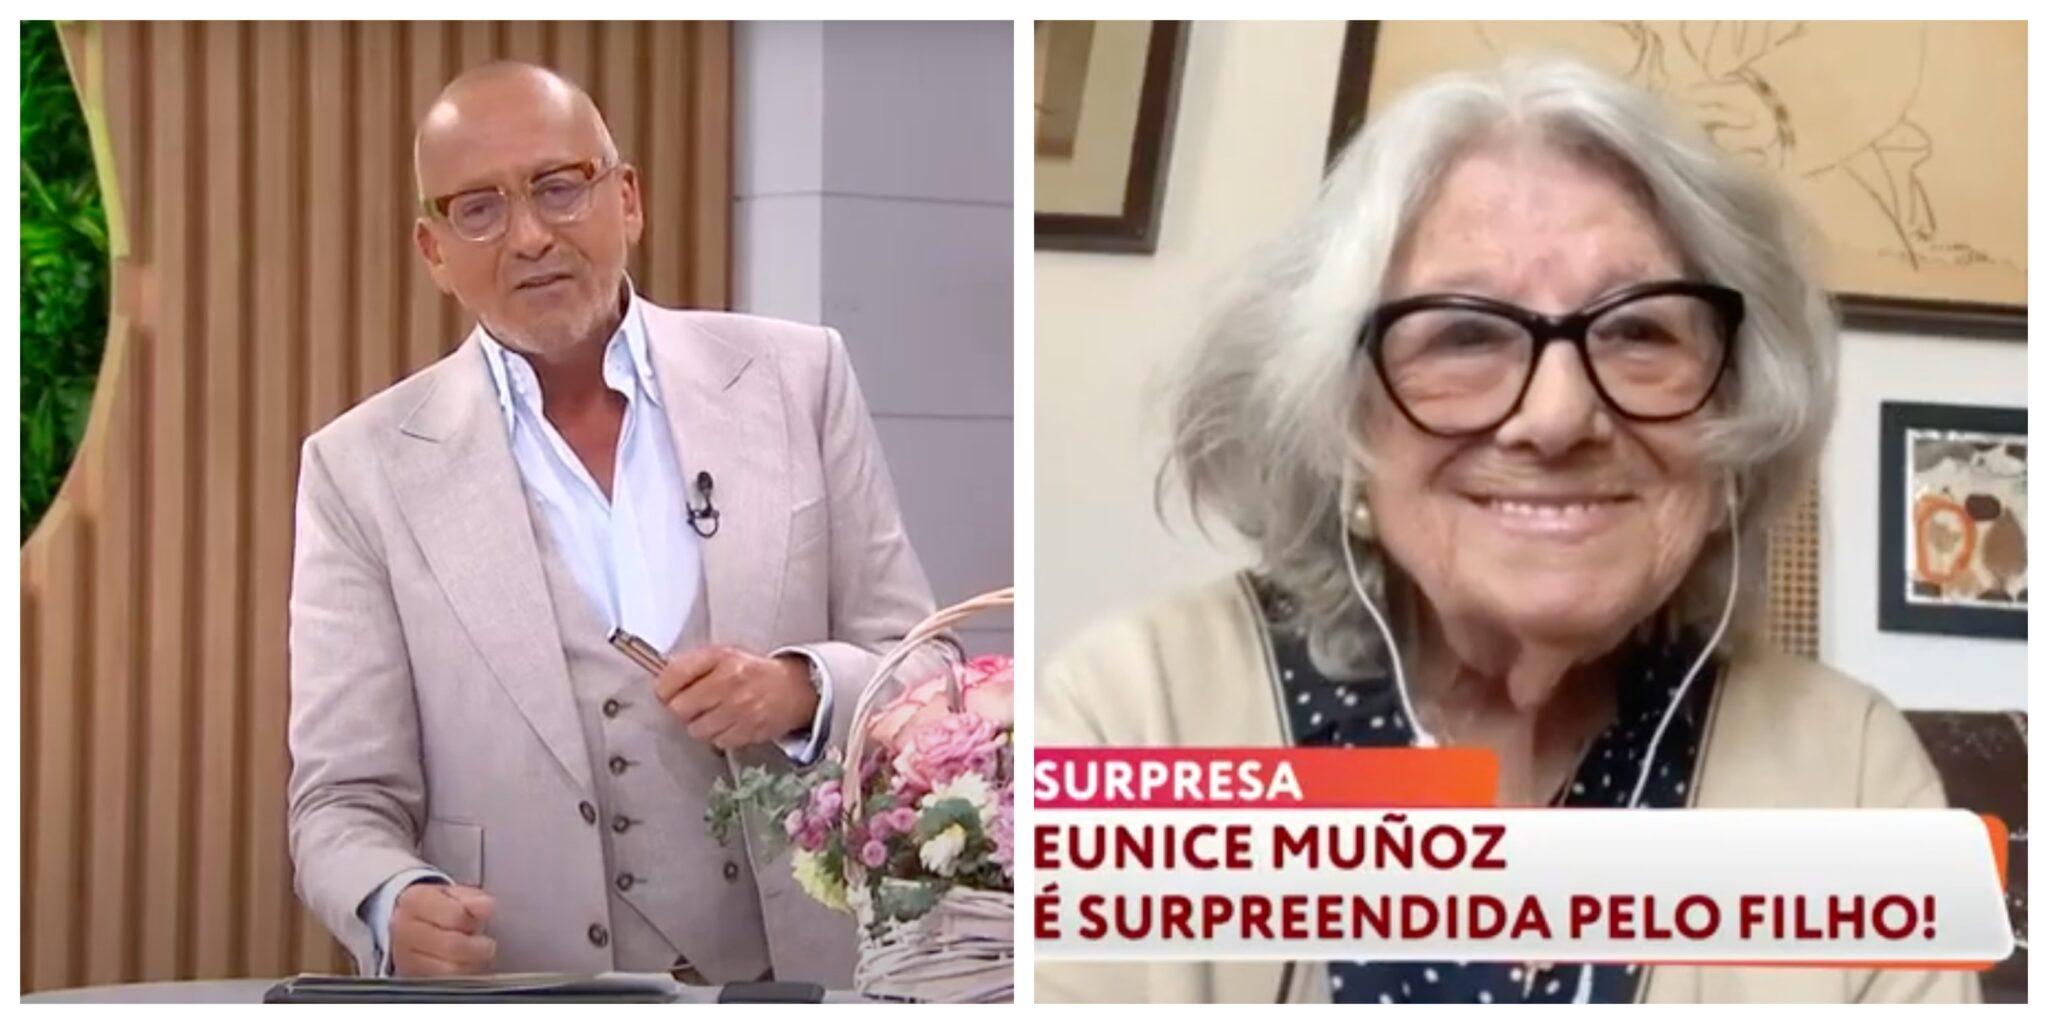 Manuel Luis Goucha Eunice Munoz Scaled Manuel Luís Goucha Emociona-Se Ao Falar Com Eunice Muñoz